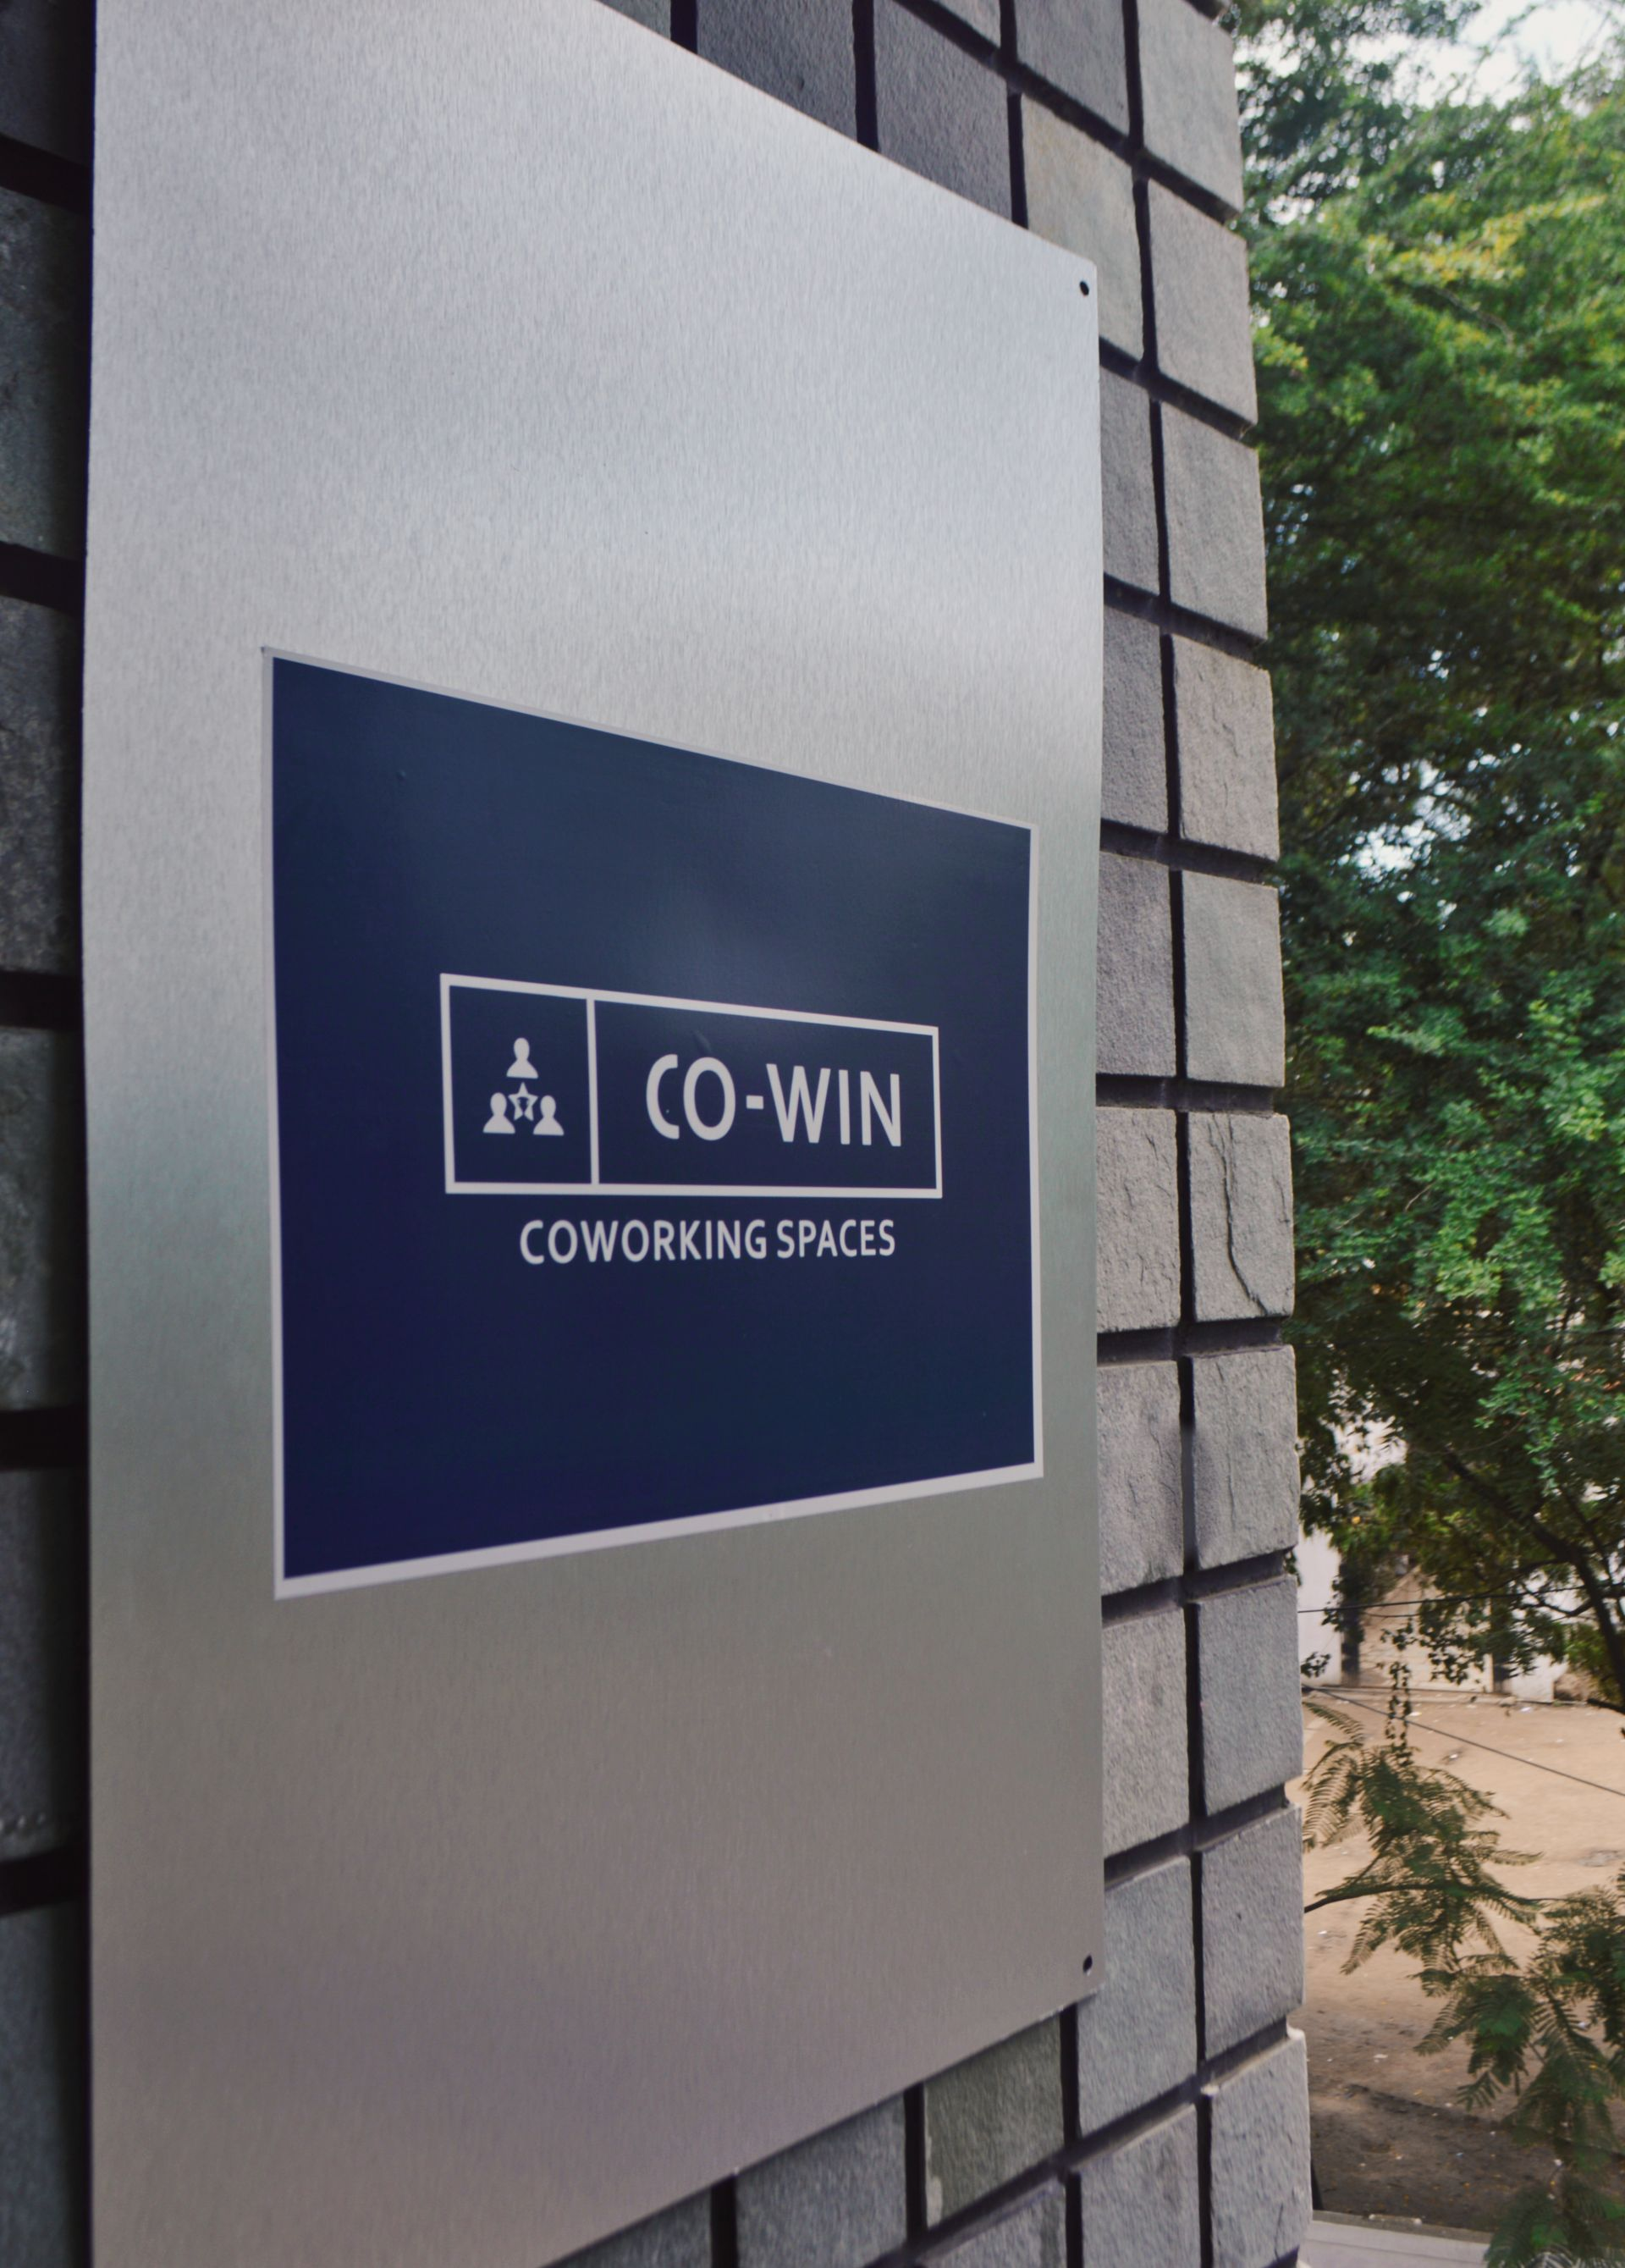 CO-WIN COWORKING SPACES, Pimpri-Chinchwad